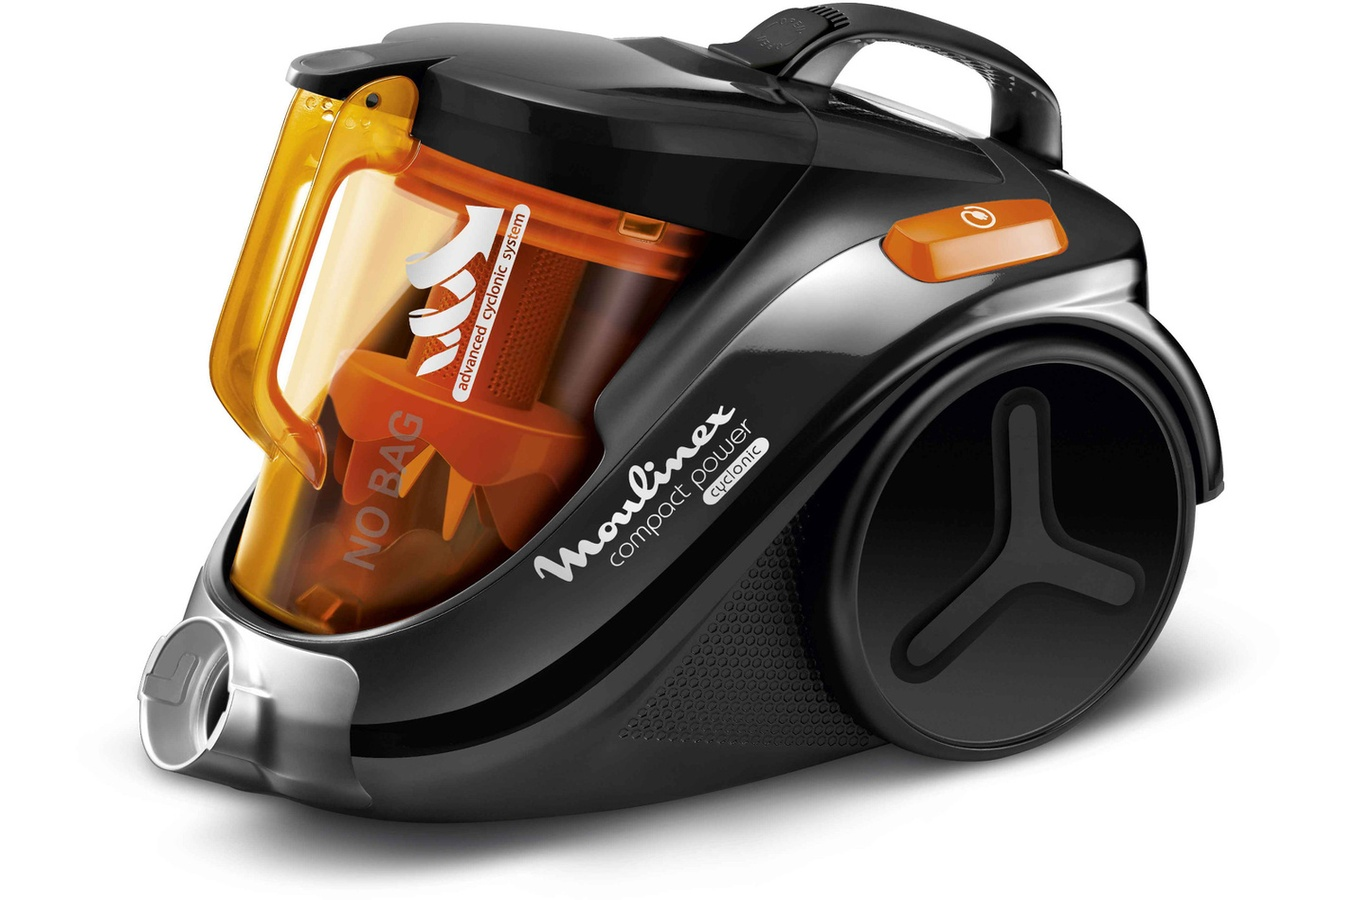 aspirateur moulinex mo3723pa